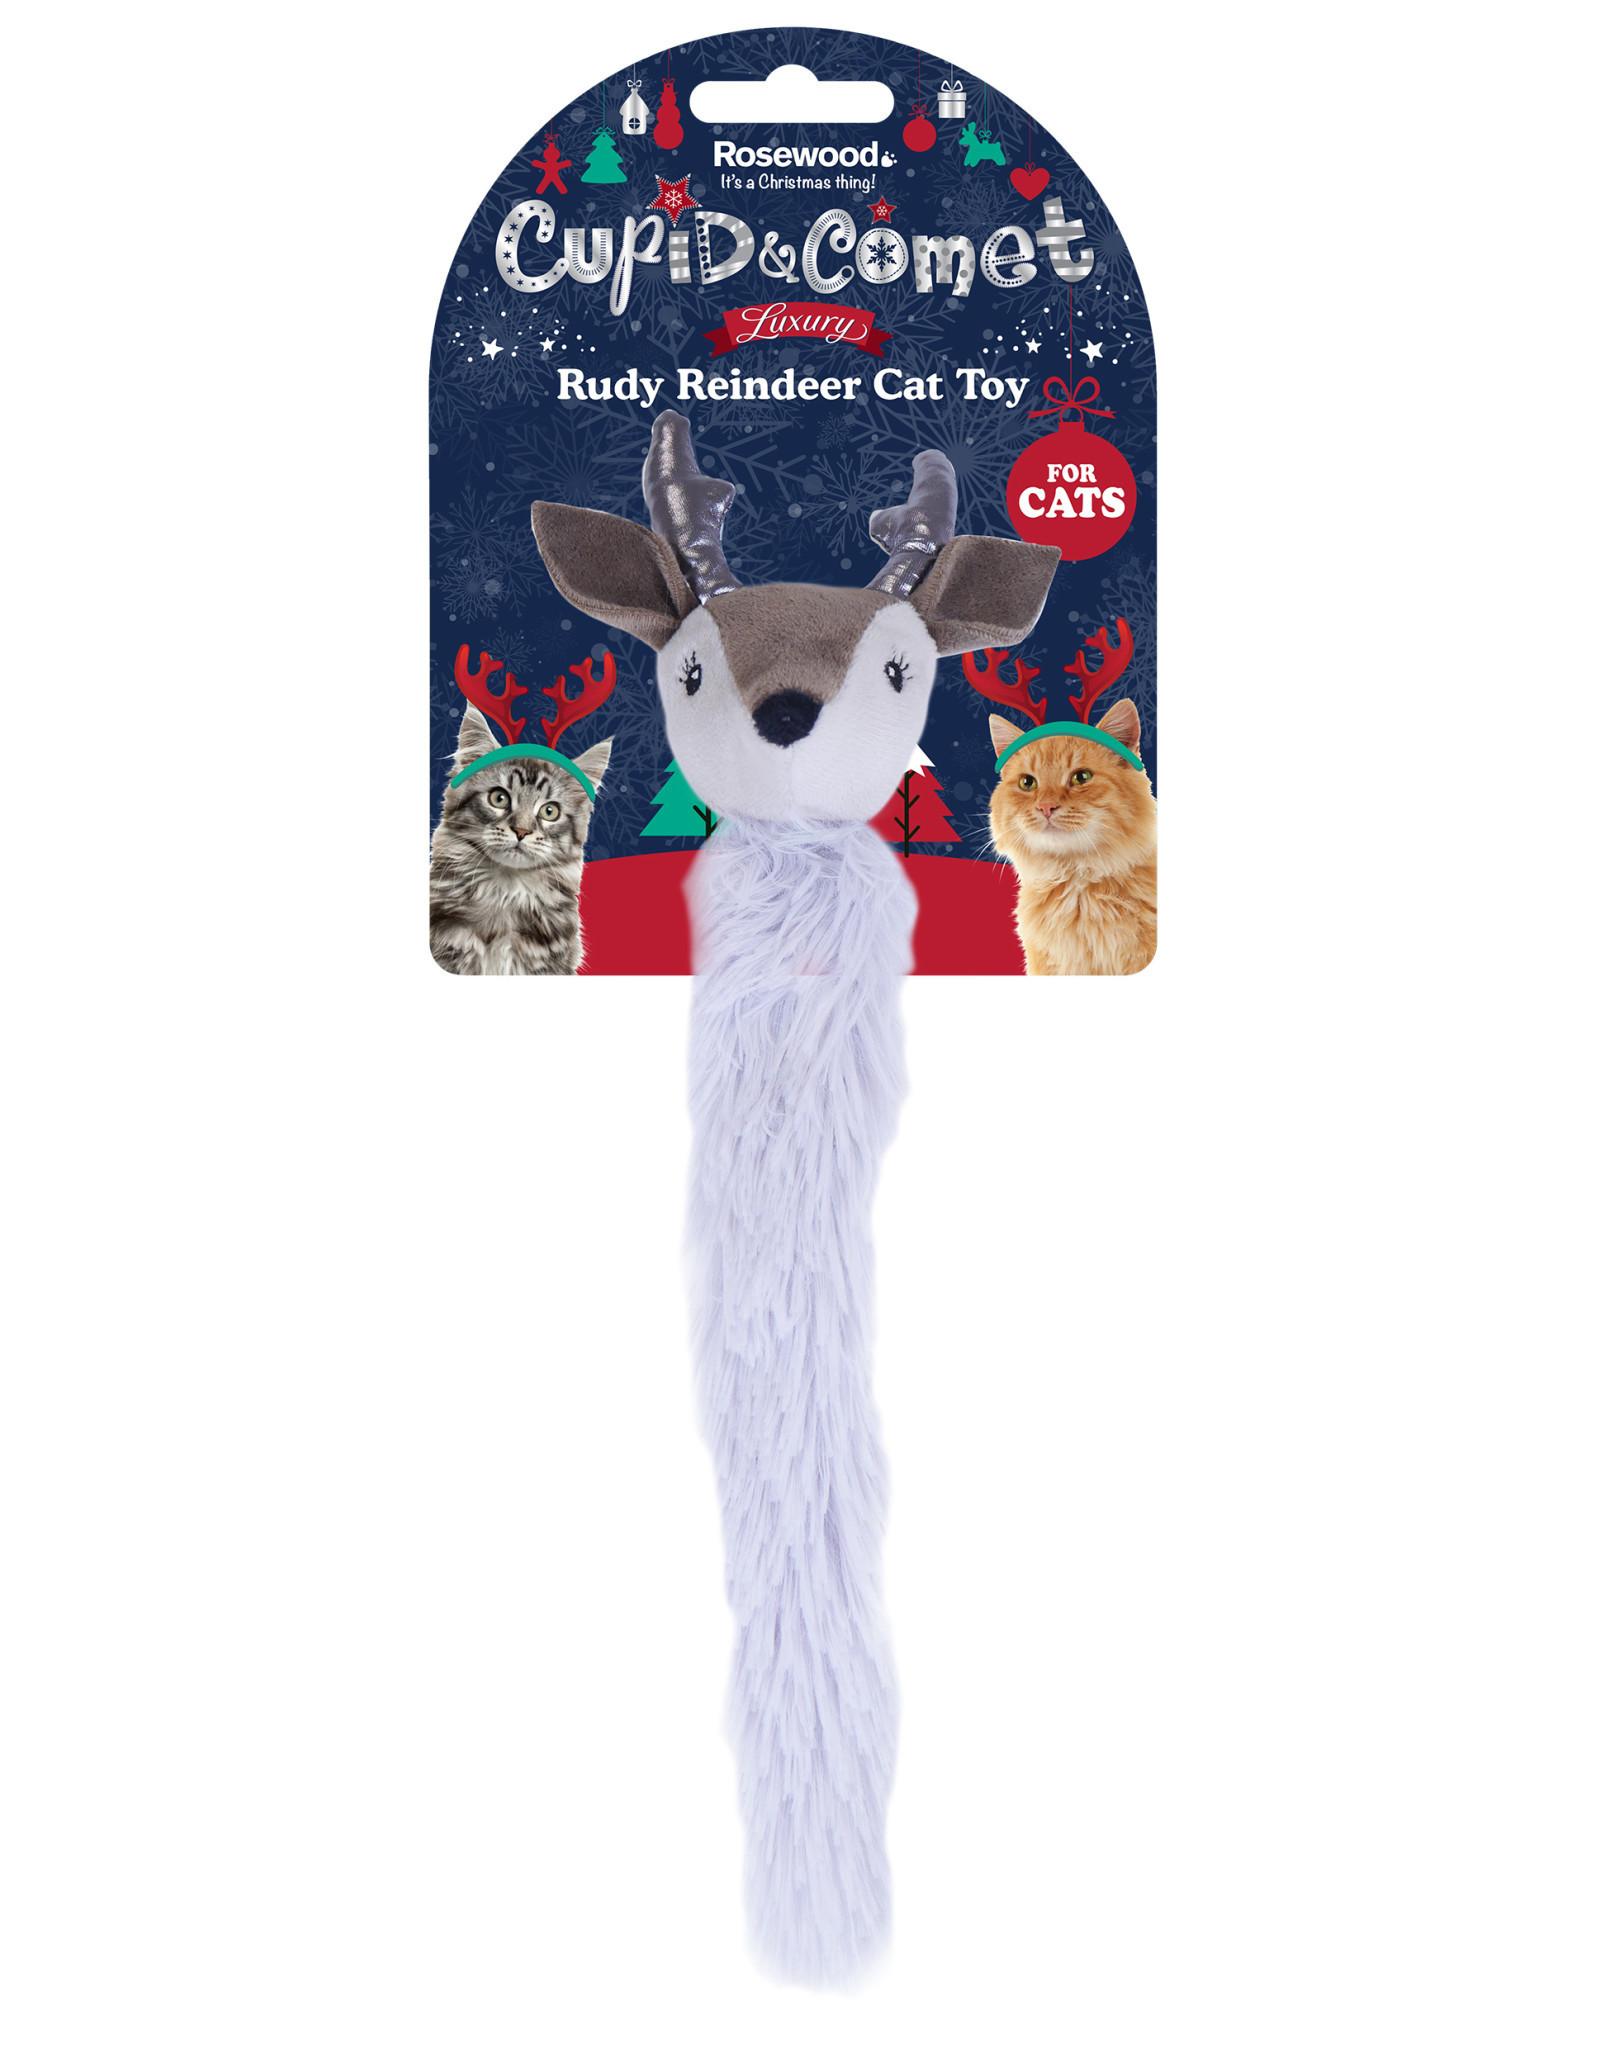 Rosewood Christmas Rudy Reindeer Cat Toy